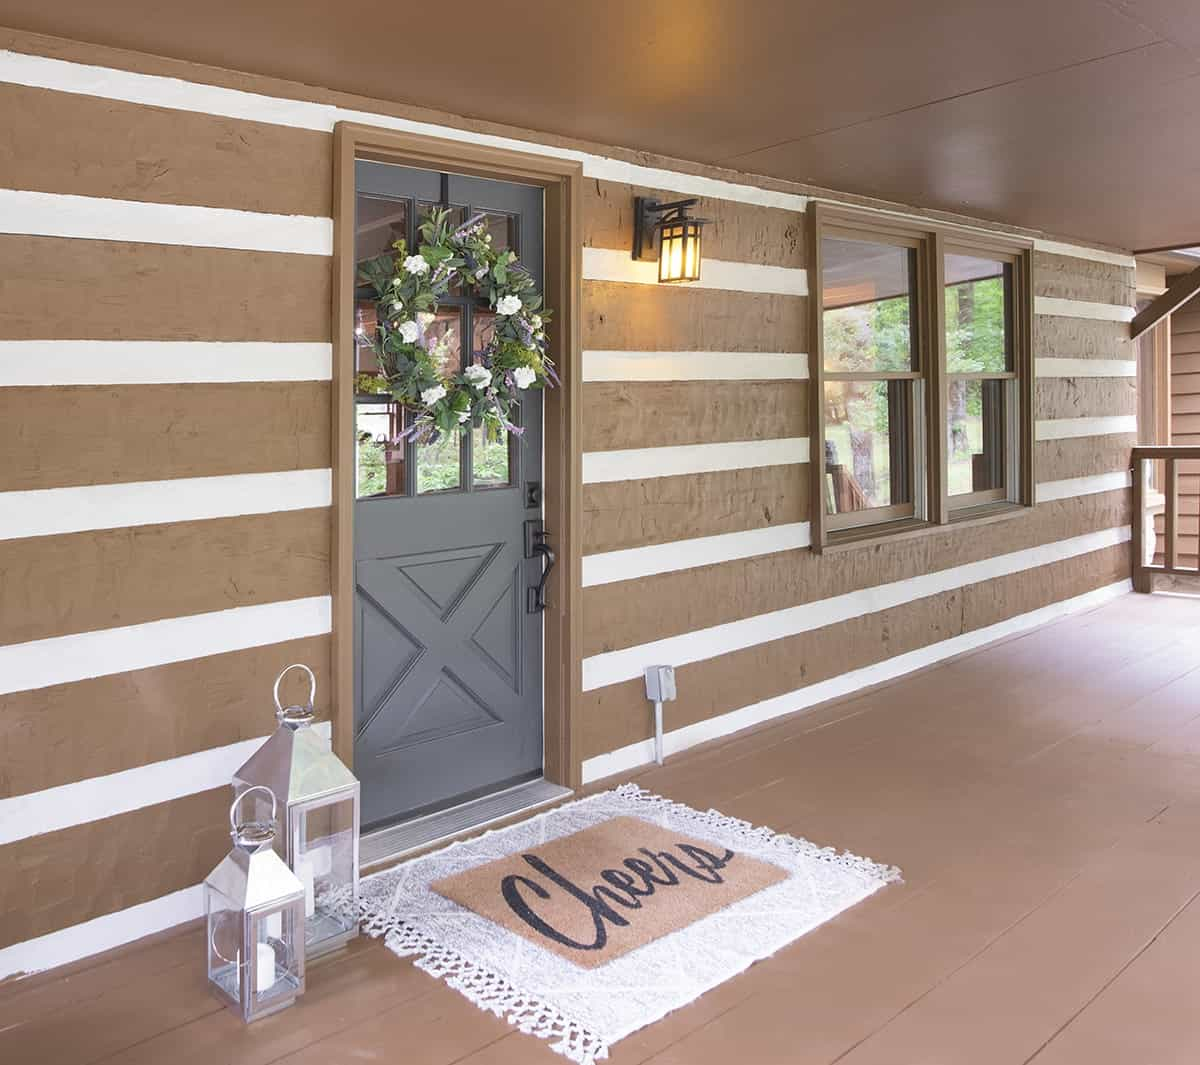 Refreshed exterior log cabin mortar